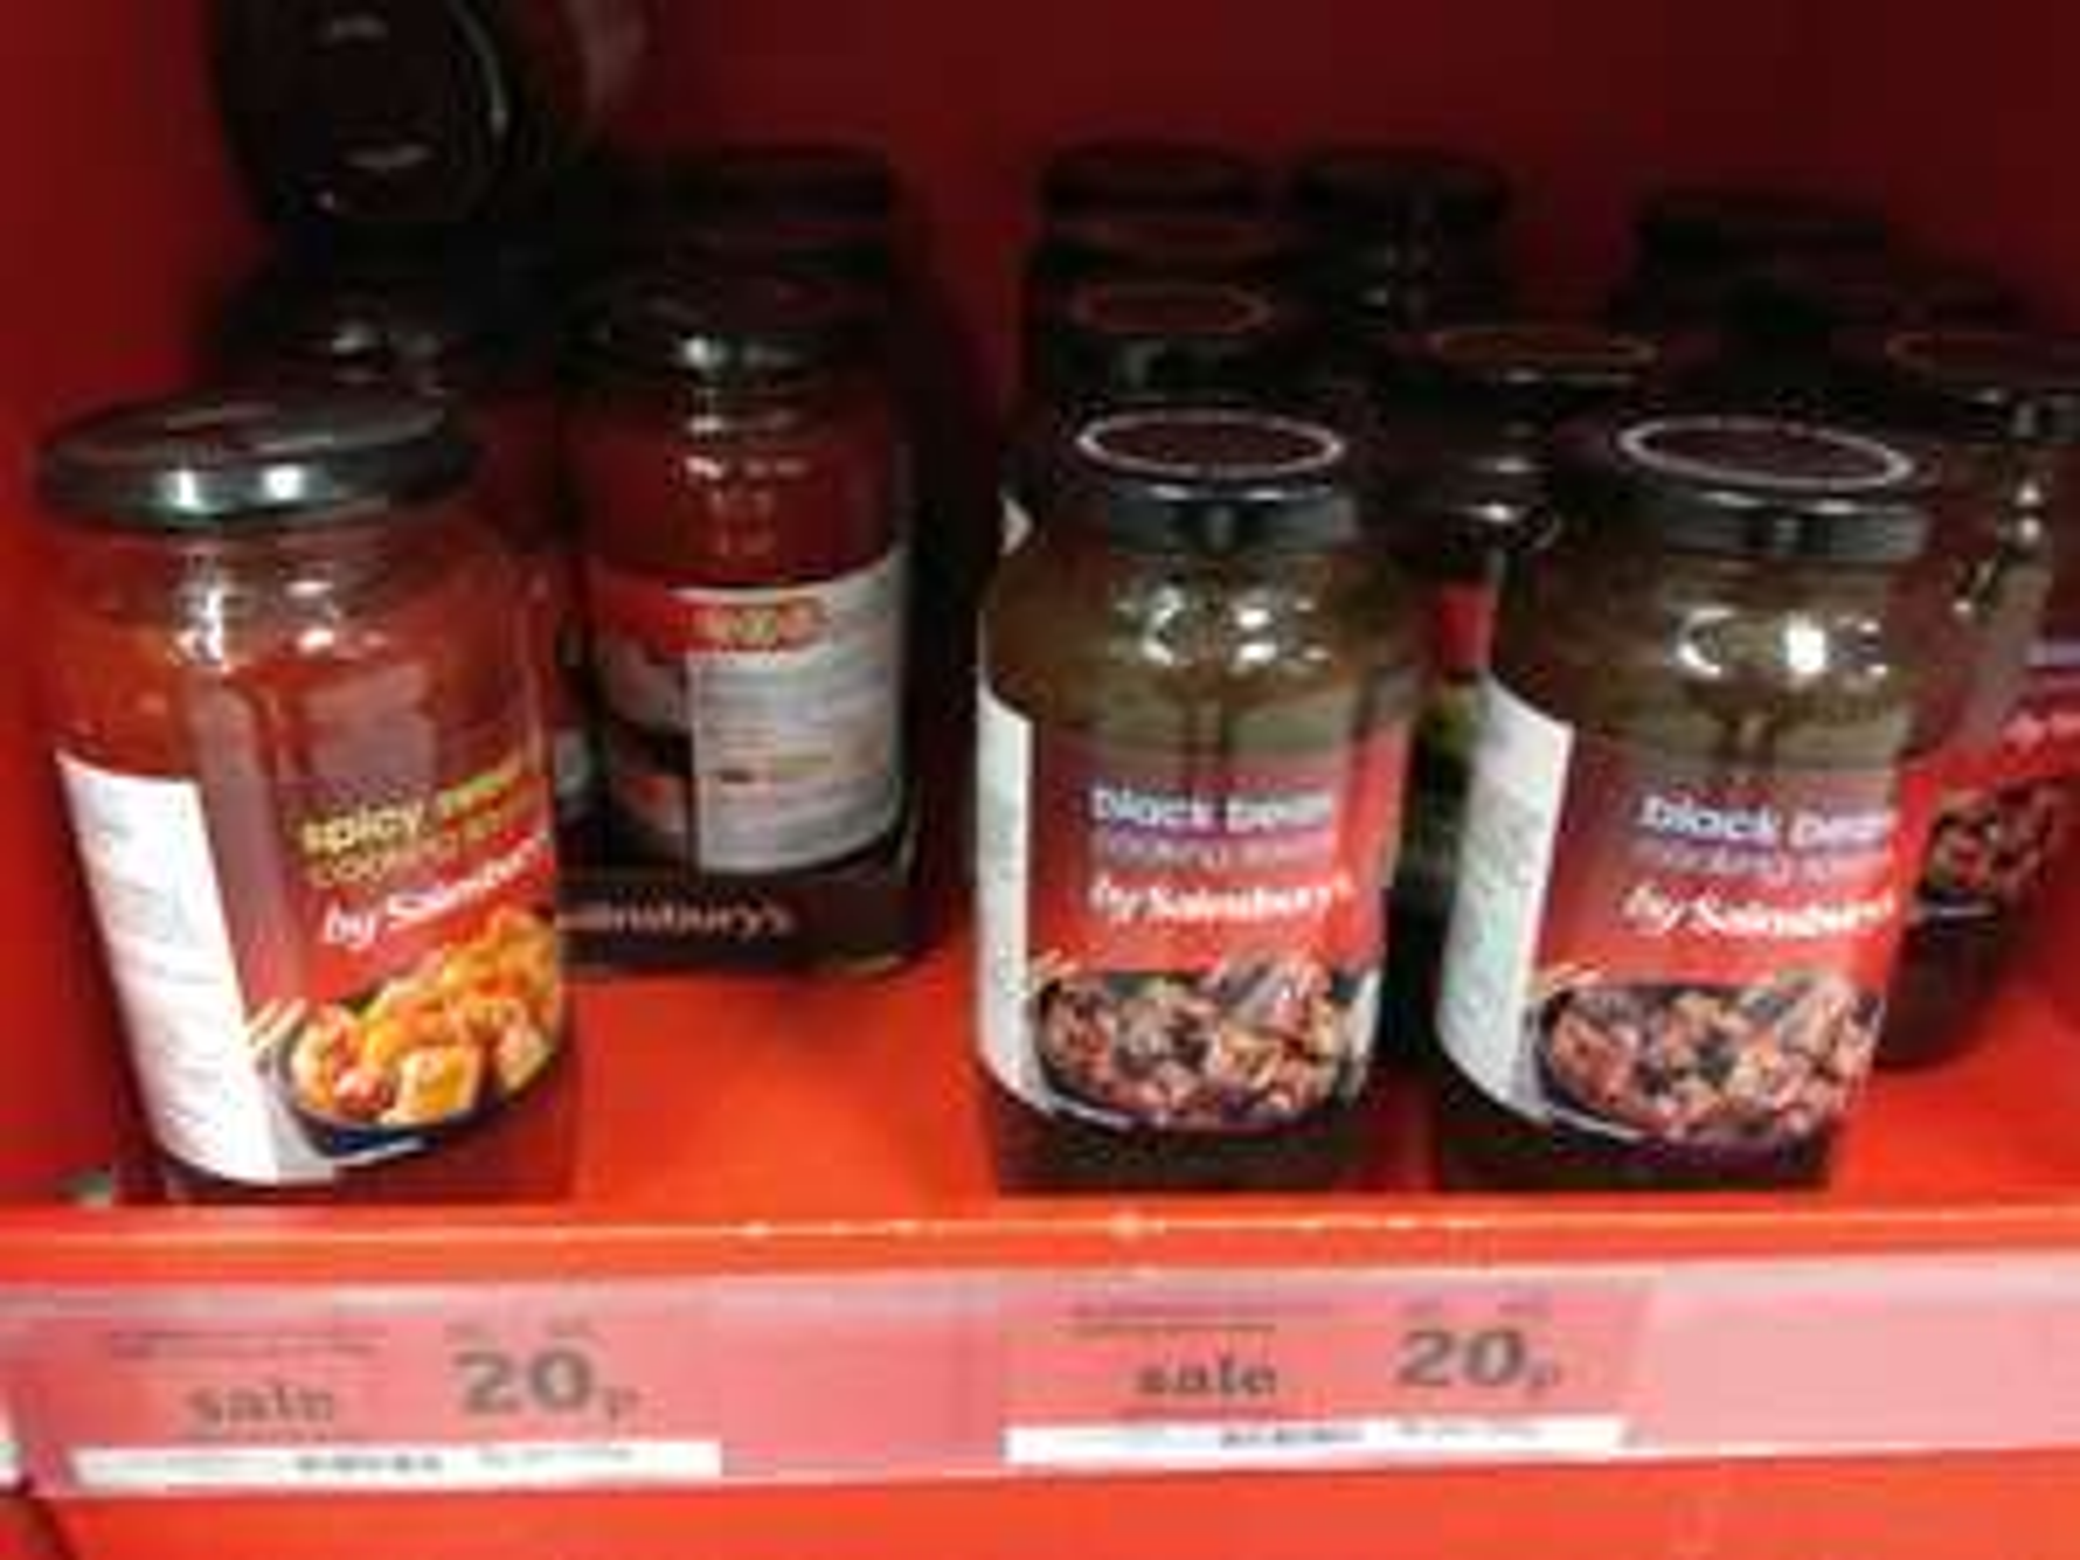 Sainsbury's black bean / spicy sweet chilli 500g cooking sauce 20p instore @ Sainsbury's